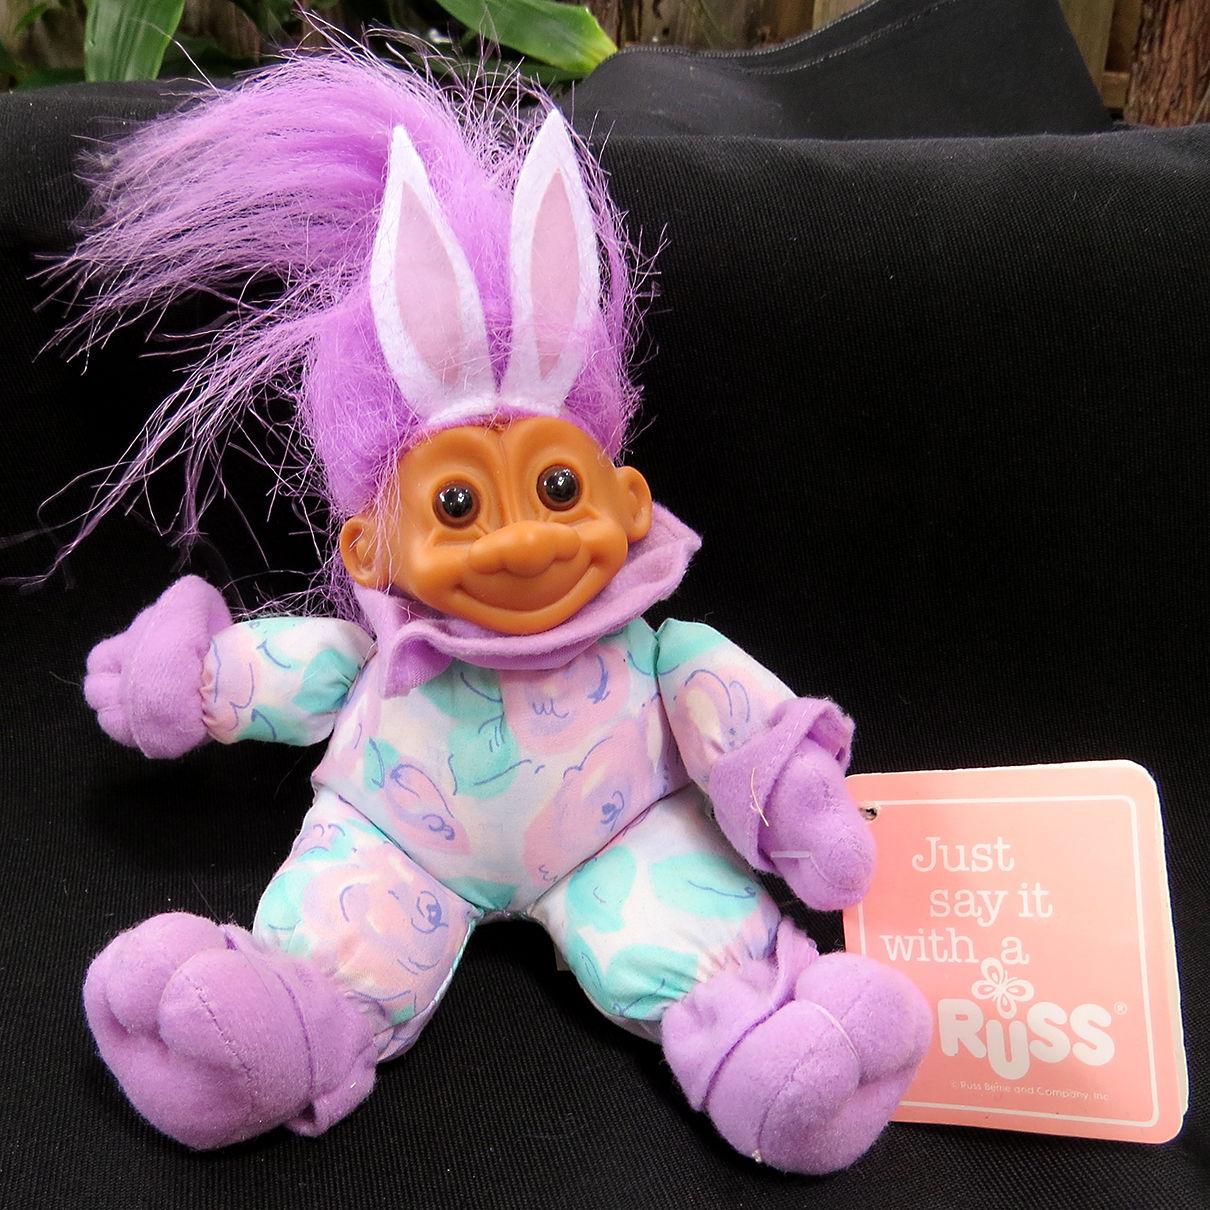 Vintage NWT Russ Easter Bunny Troll Doll Plush Rabbit Ears Holiday Purple Hair - $16.49